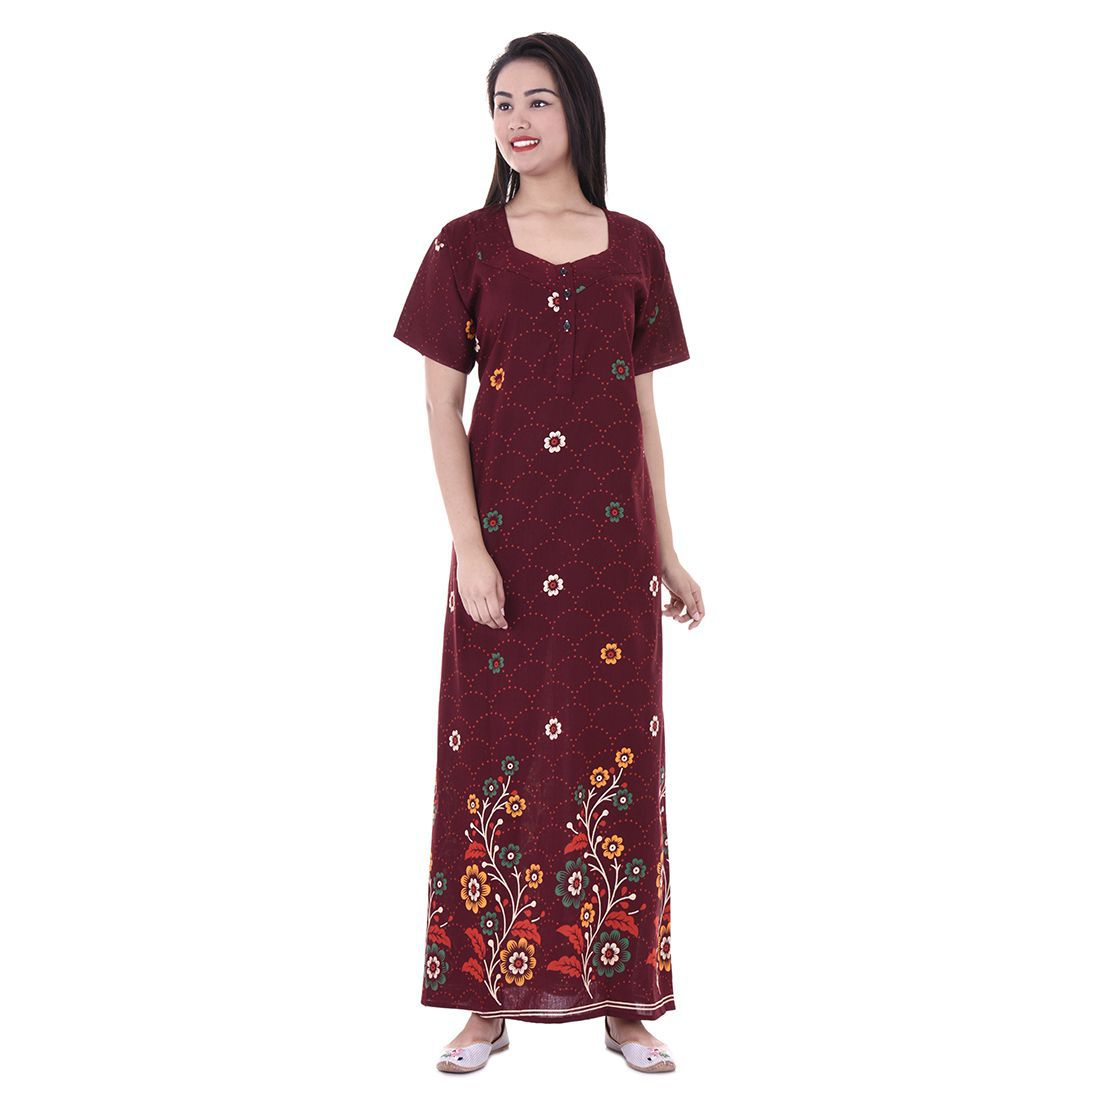 Indian Style Hot Looking Women Nightwear Gown / Bikini Cover